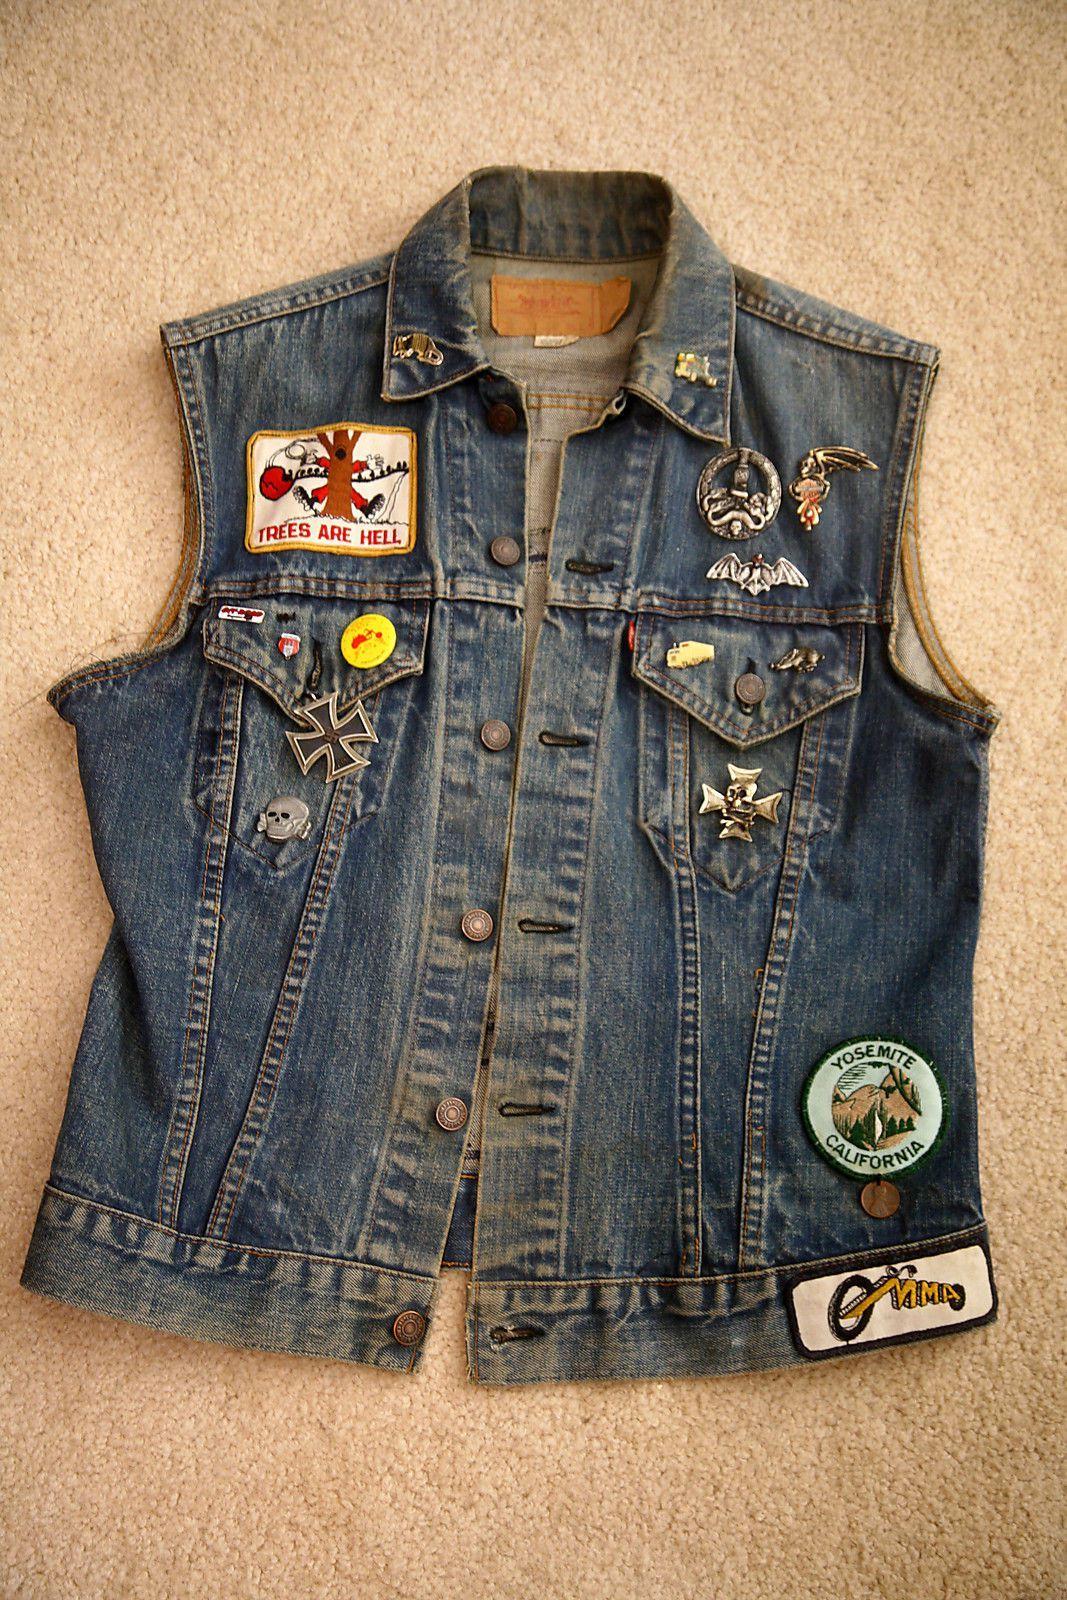 Vintage Motorcycle Club Vest Ghostriders Front Motorcycle Clubs Vintage Clothing Men Vintage Denim Jeans